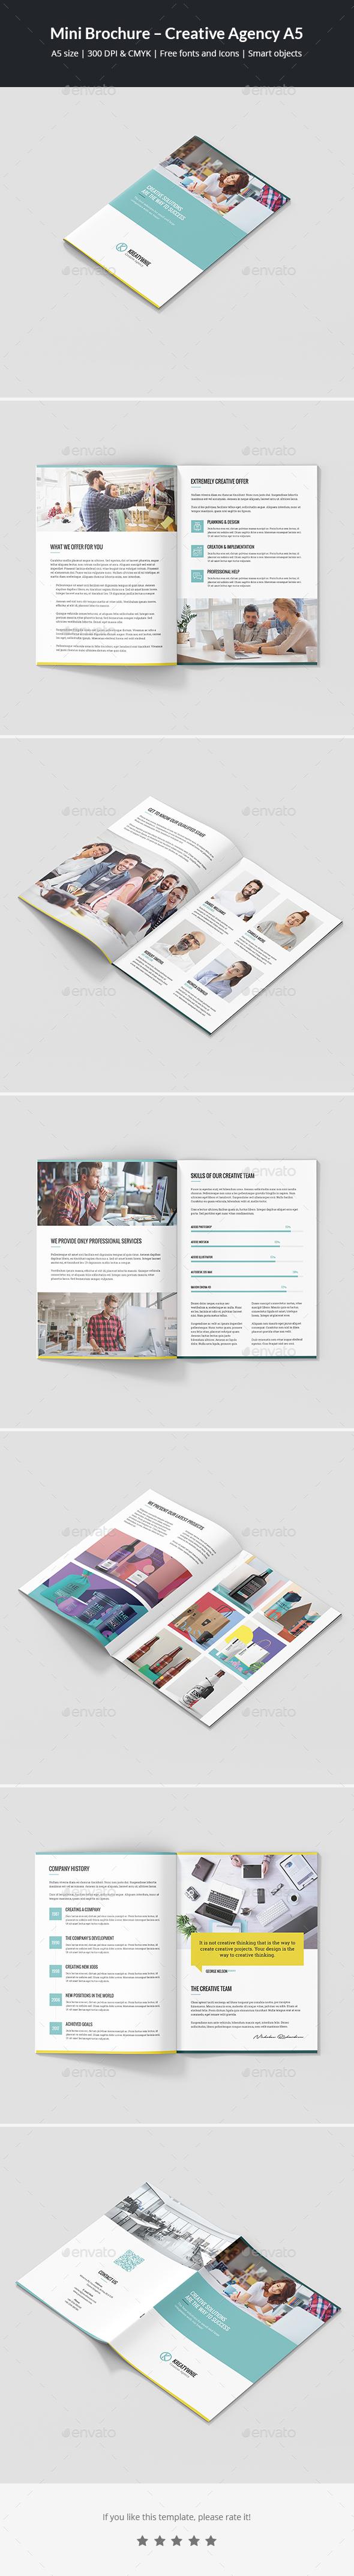 Mini Brochure – Creative Agency A5 - Corporate Brochures